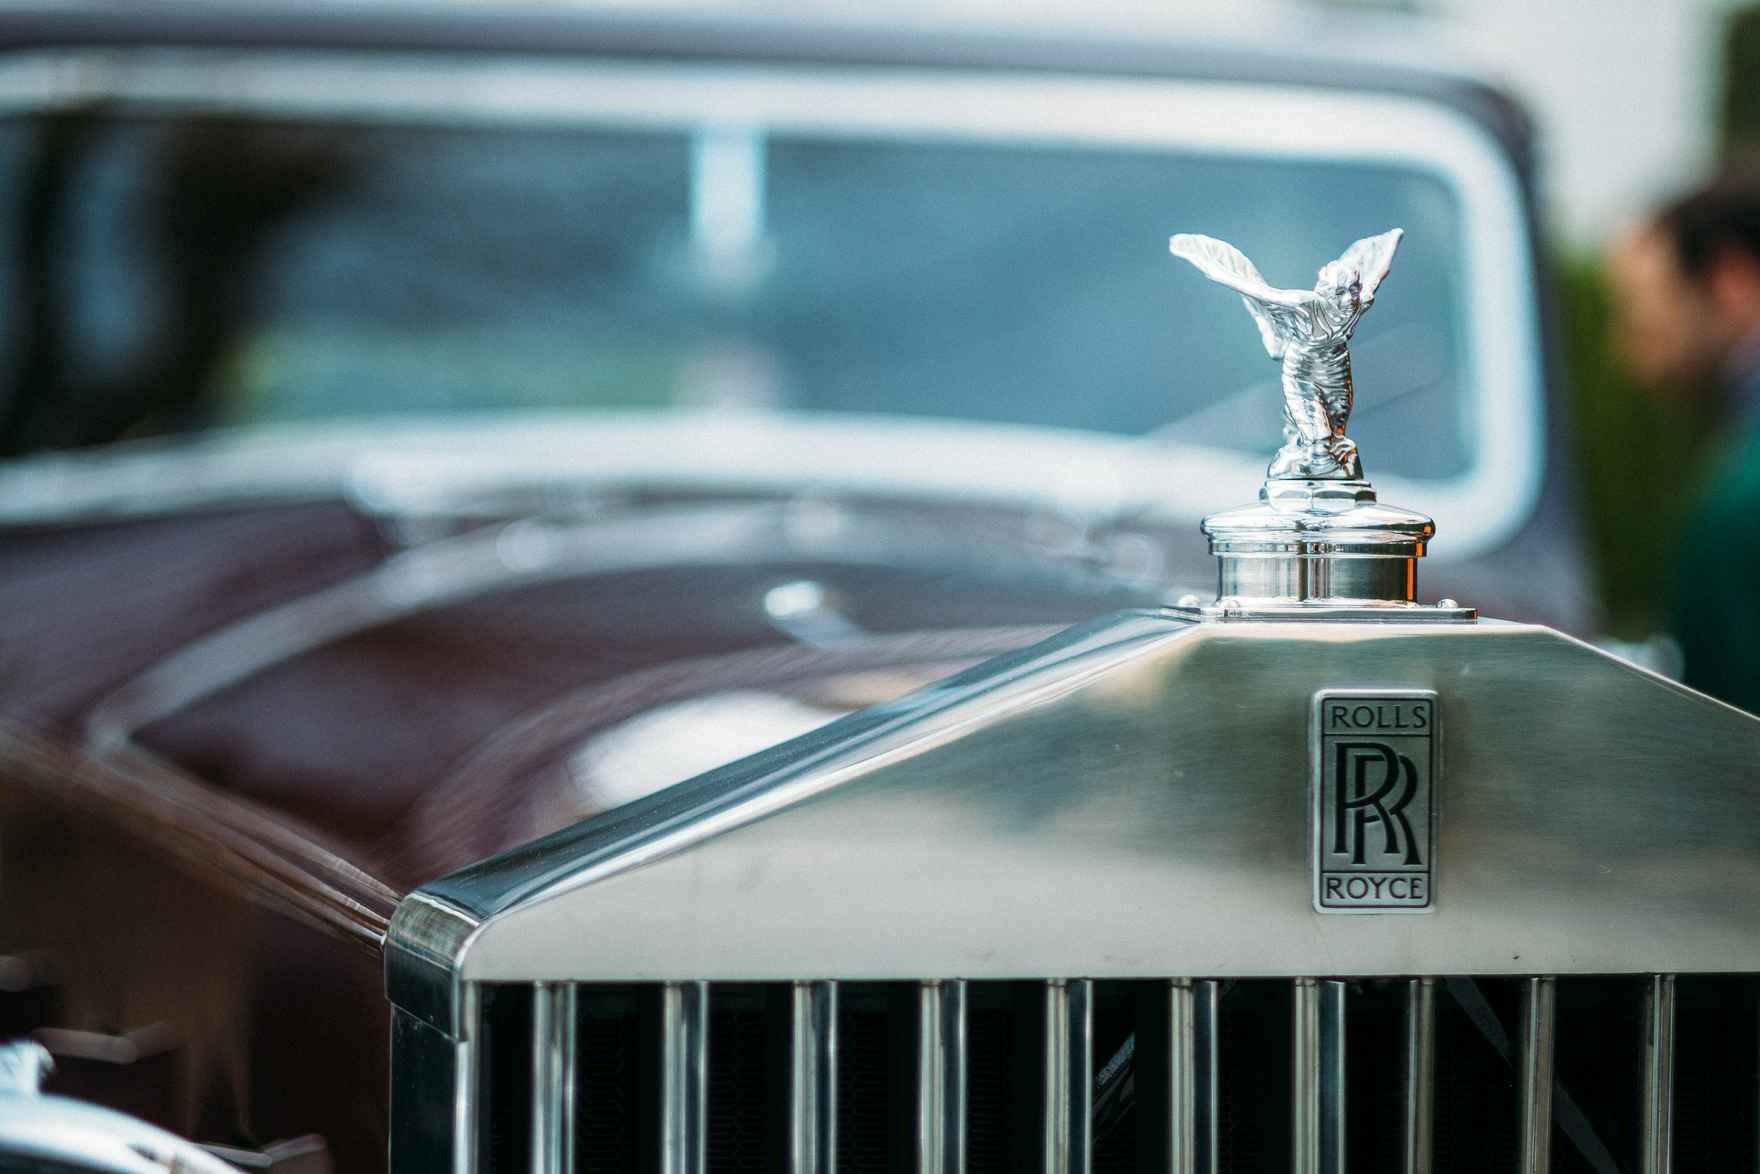 Rolls royce david-hellmann-ZDeQTKPb4eI-unsplash